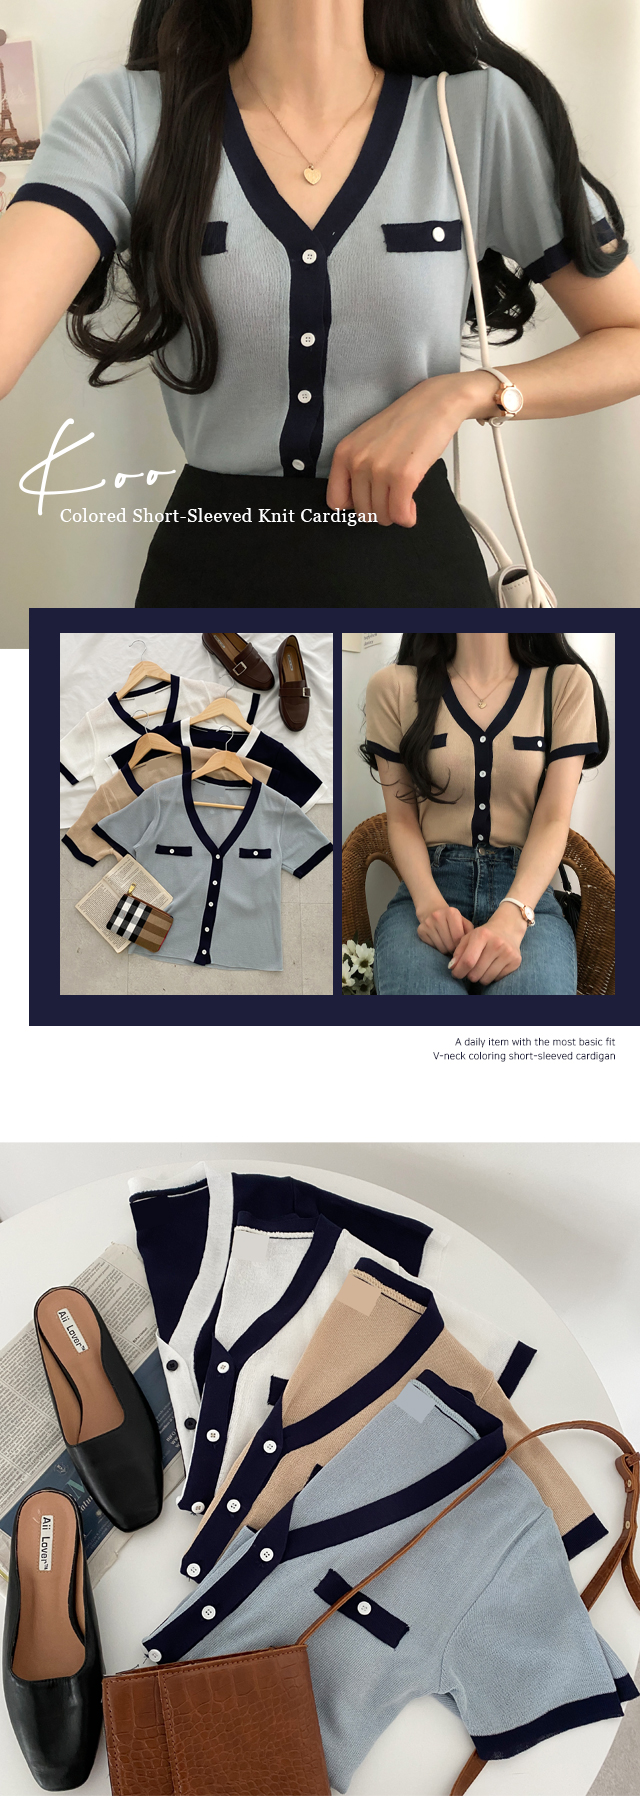 Kou Color Short Sleeve Knitwear Cardigan